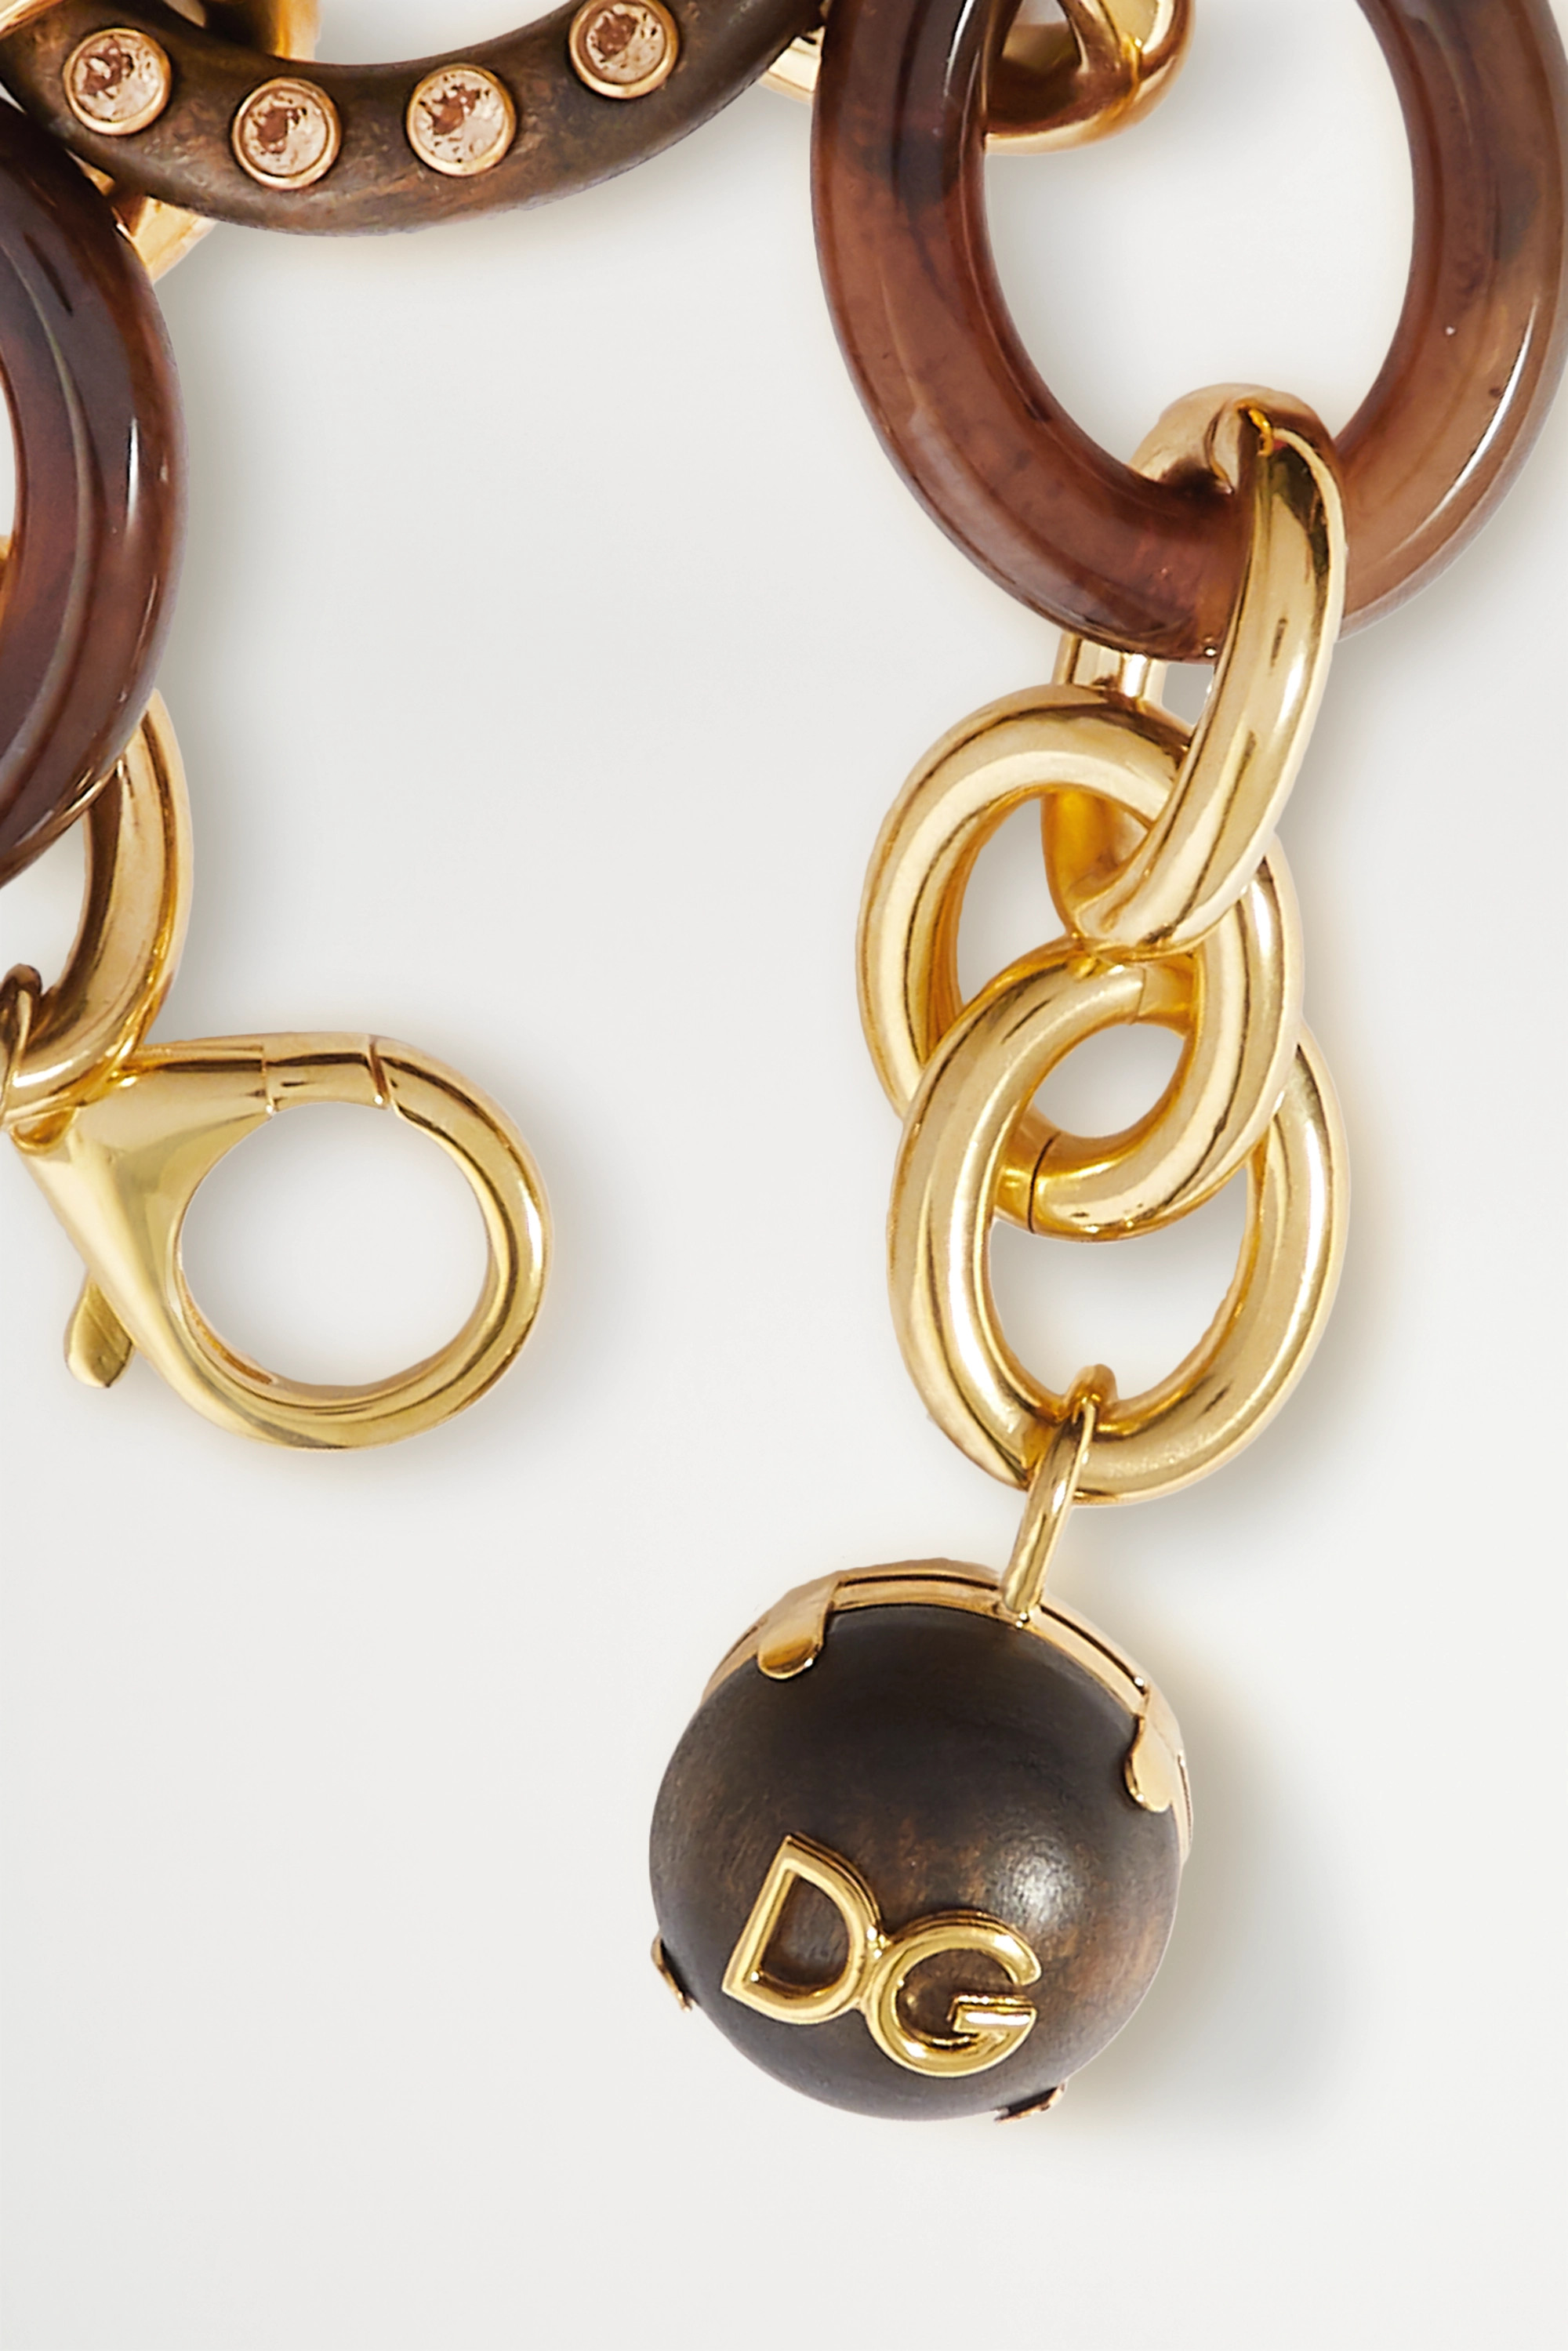 Dolce & Gabbana Gold-tone, resin, wood and crystal bracelet